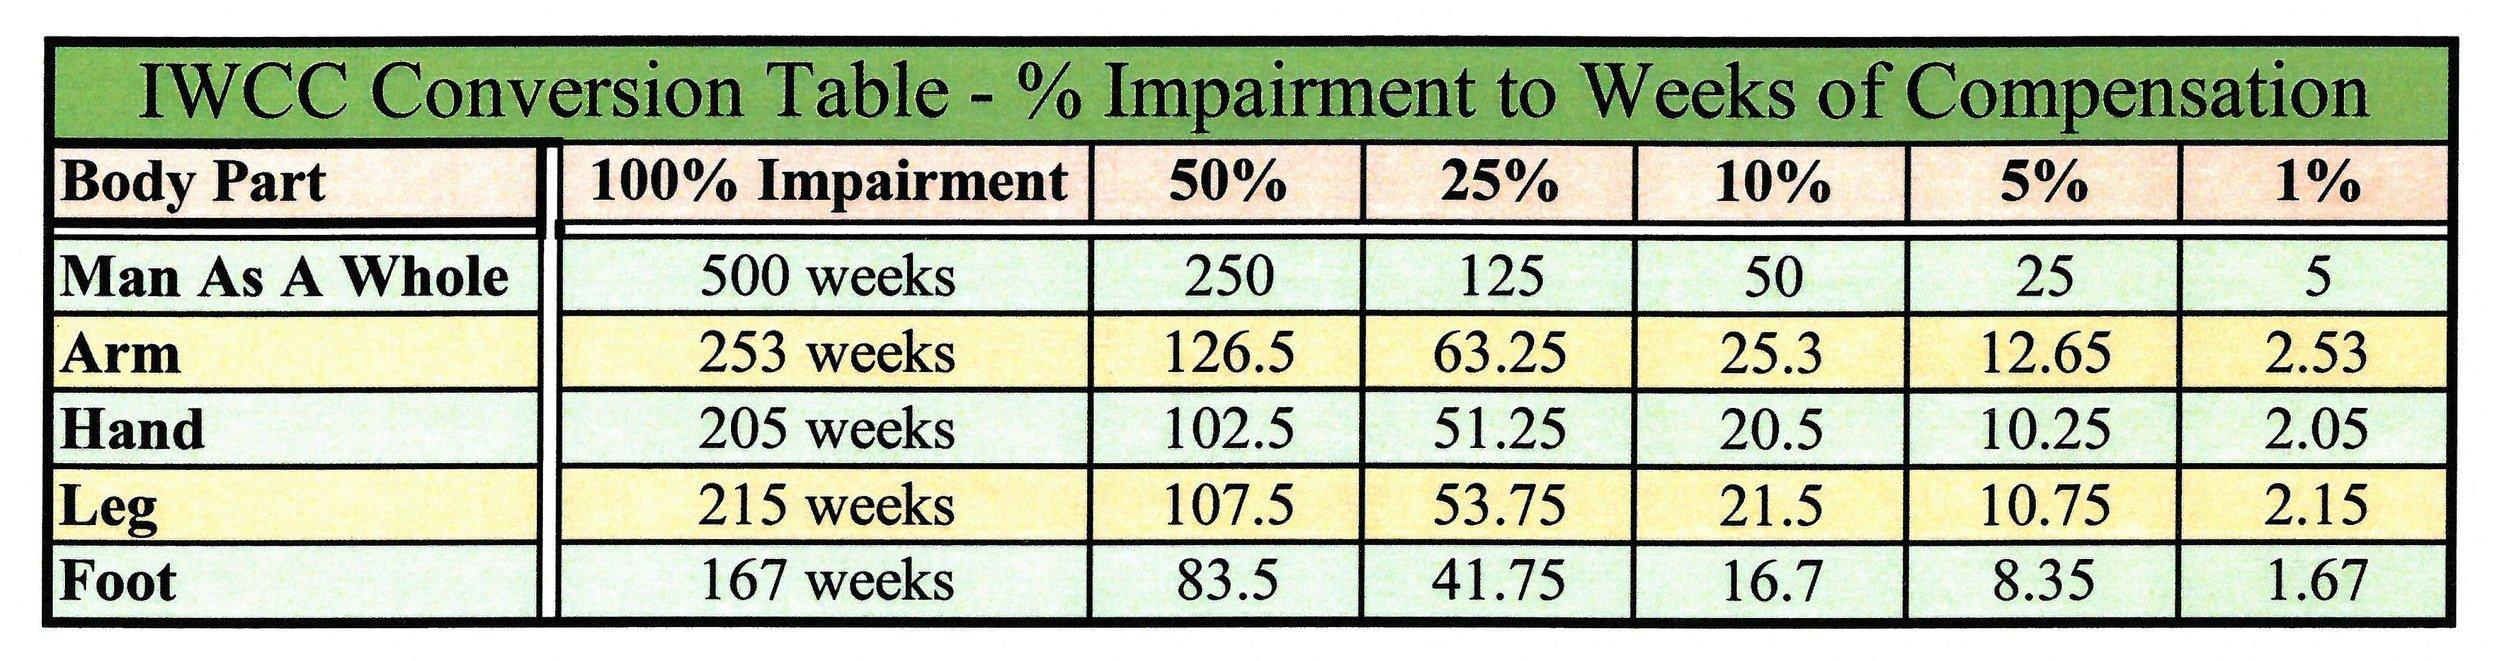 IWCC Impairment Conversion Table.jpg